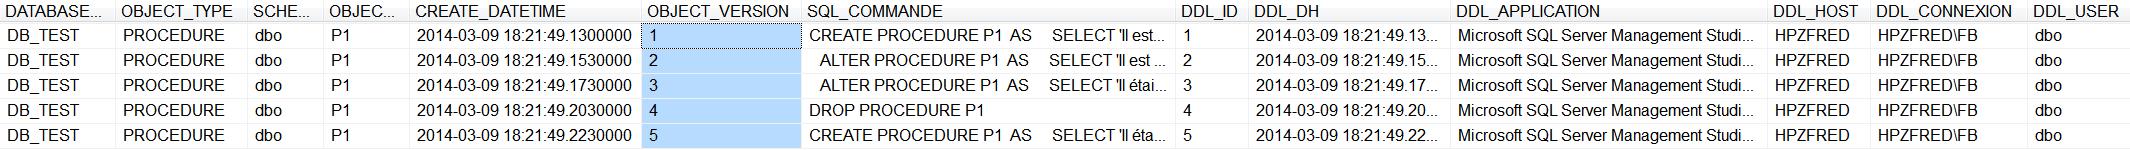 versionning SQL server